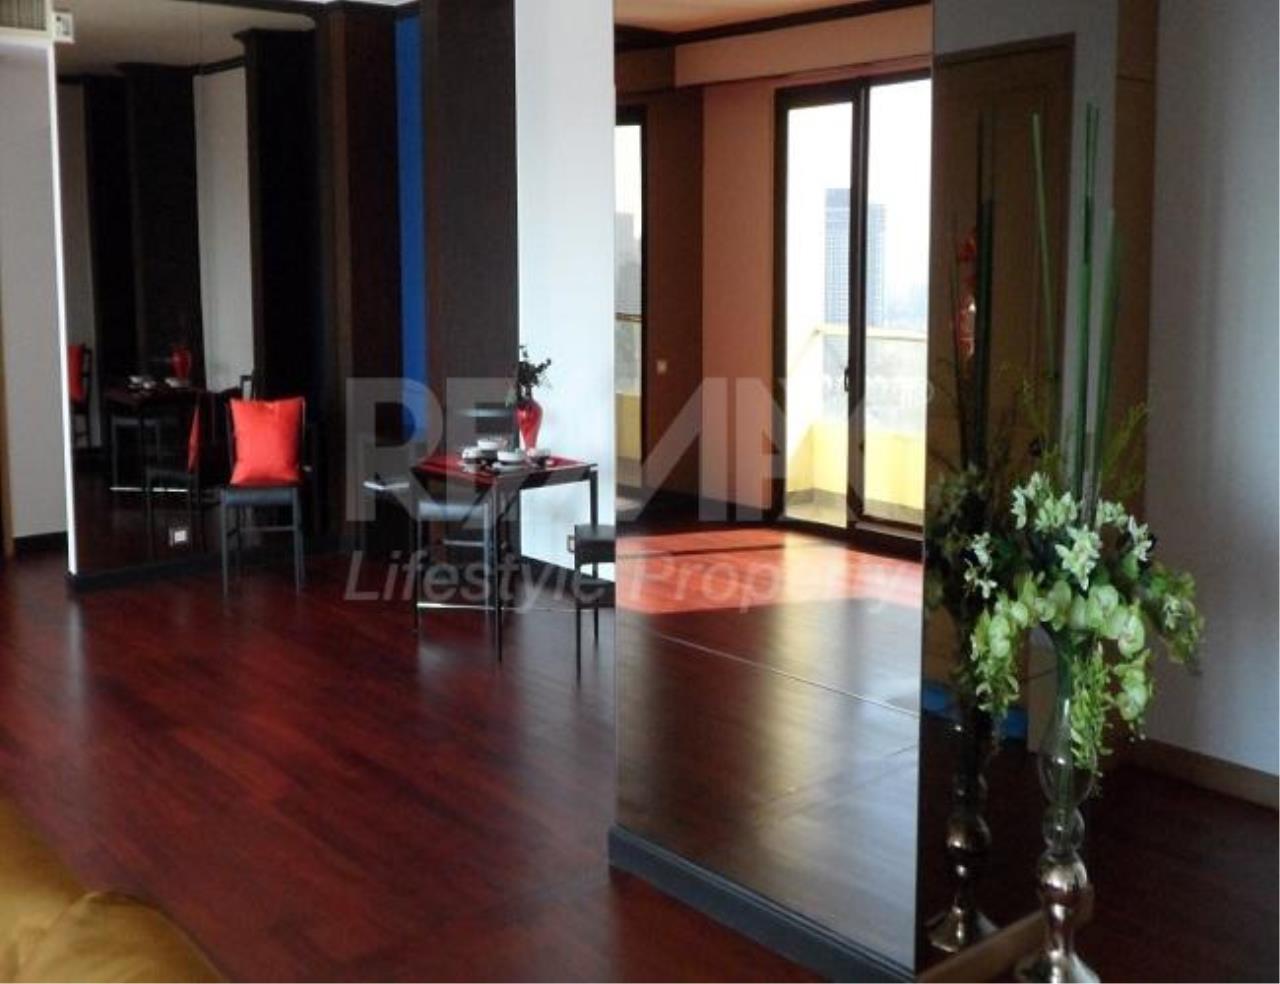 RE/MAX LifeStyle Property Agency's Baan Chao Praya 5